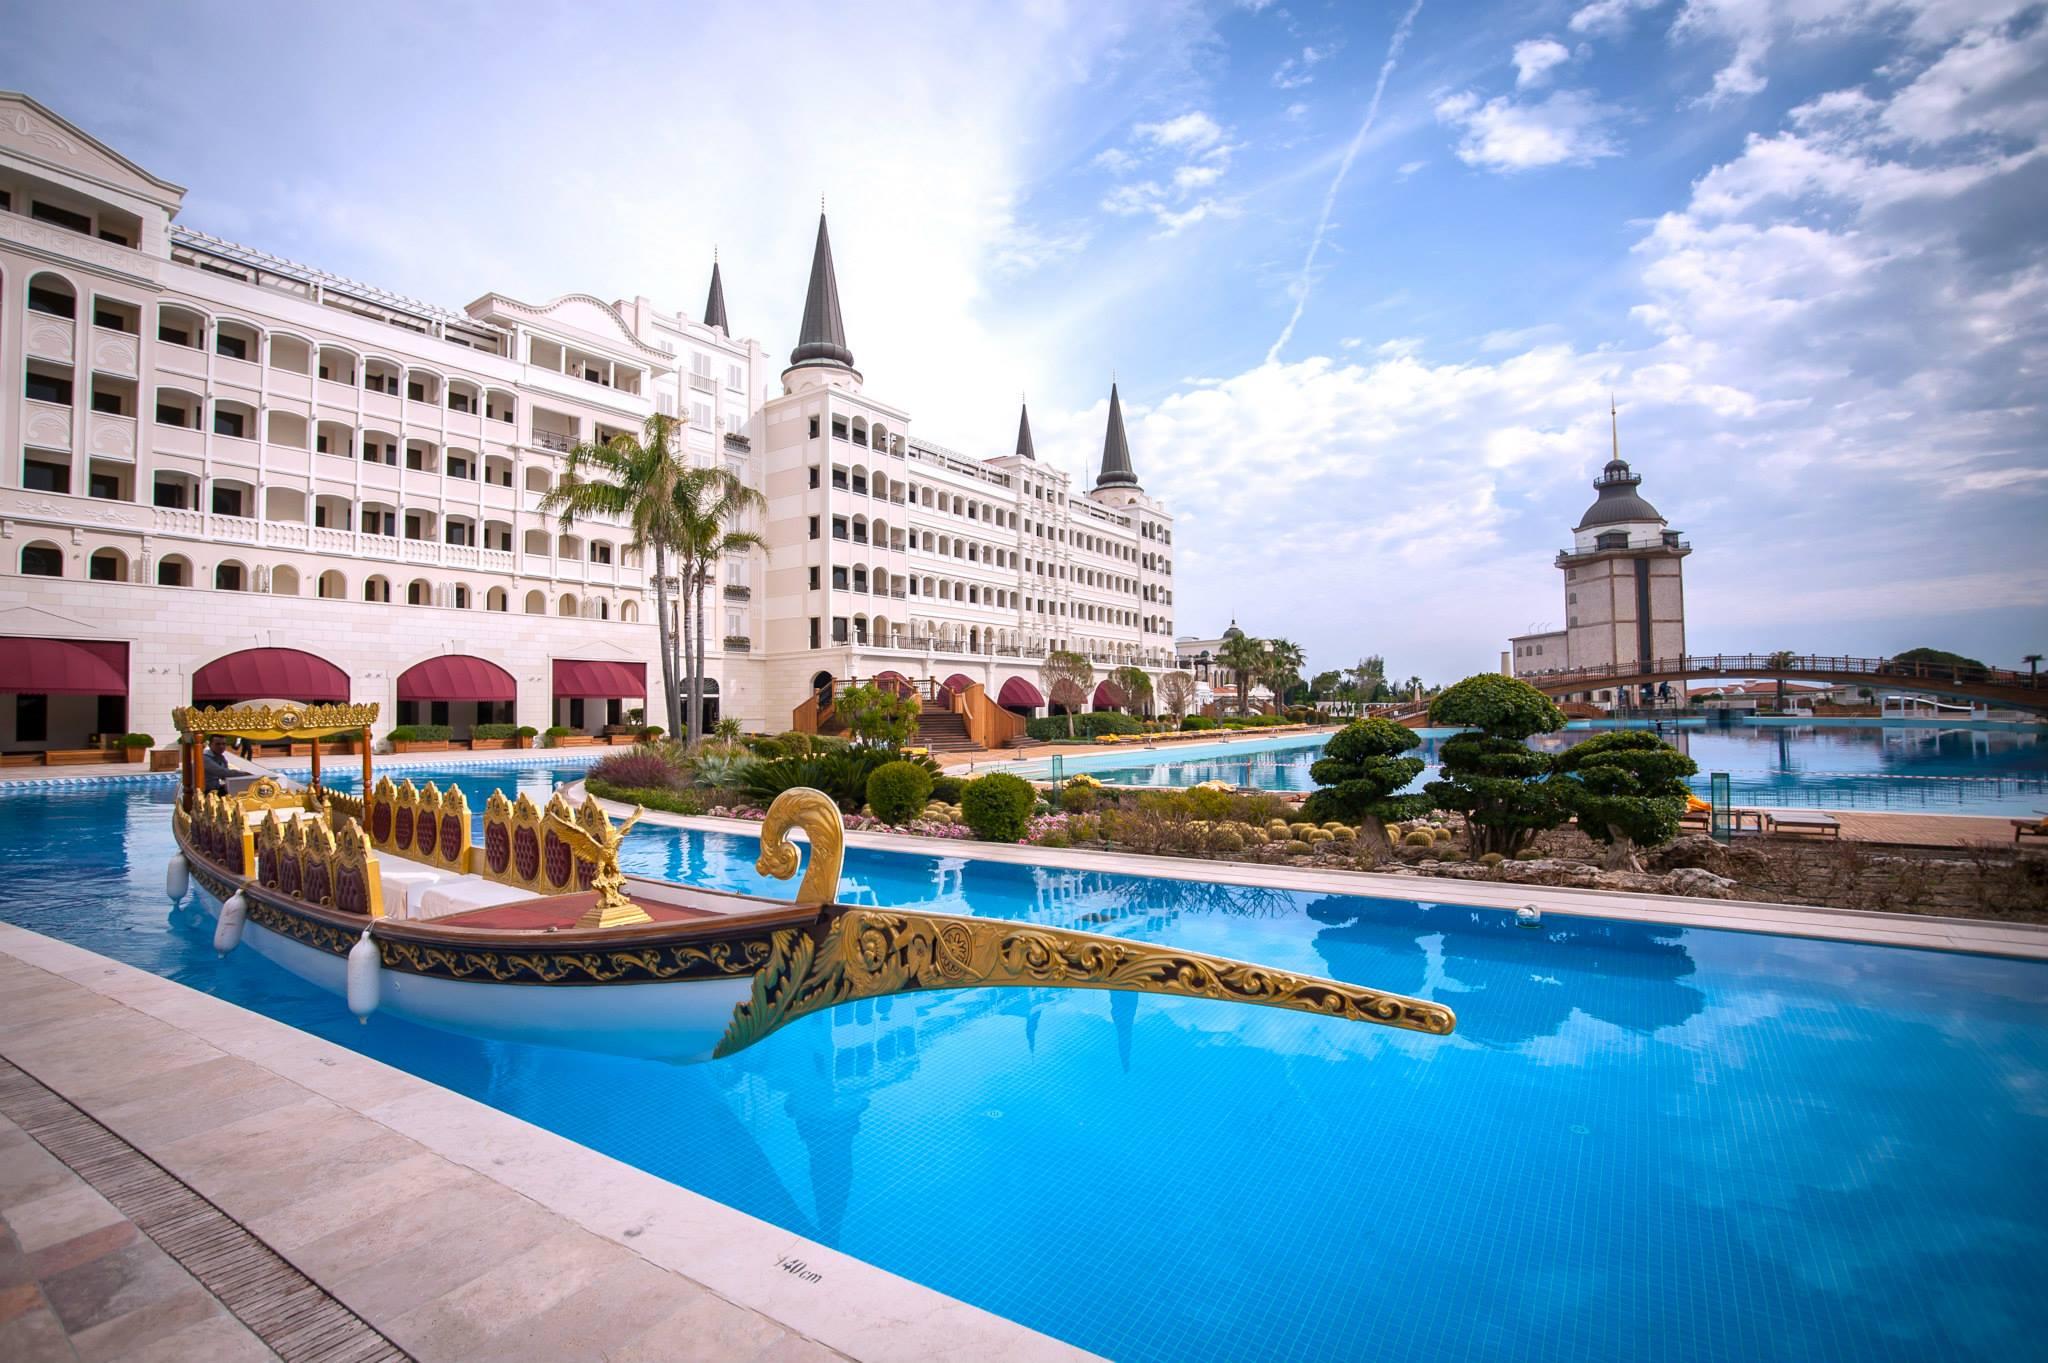 Hotel Mardan Palace Antalya Turkey